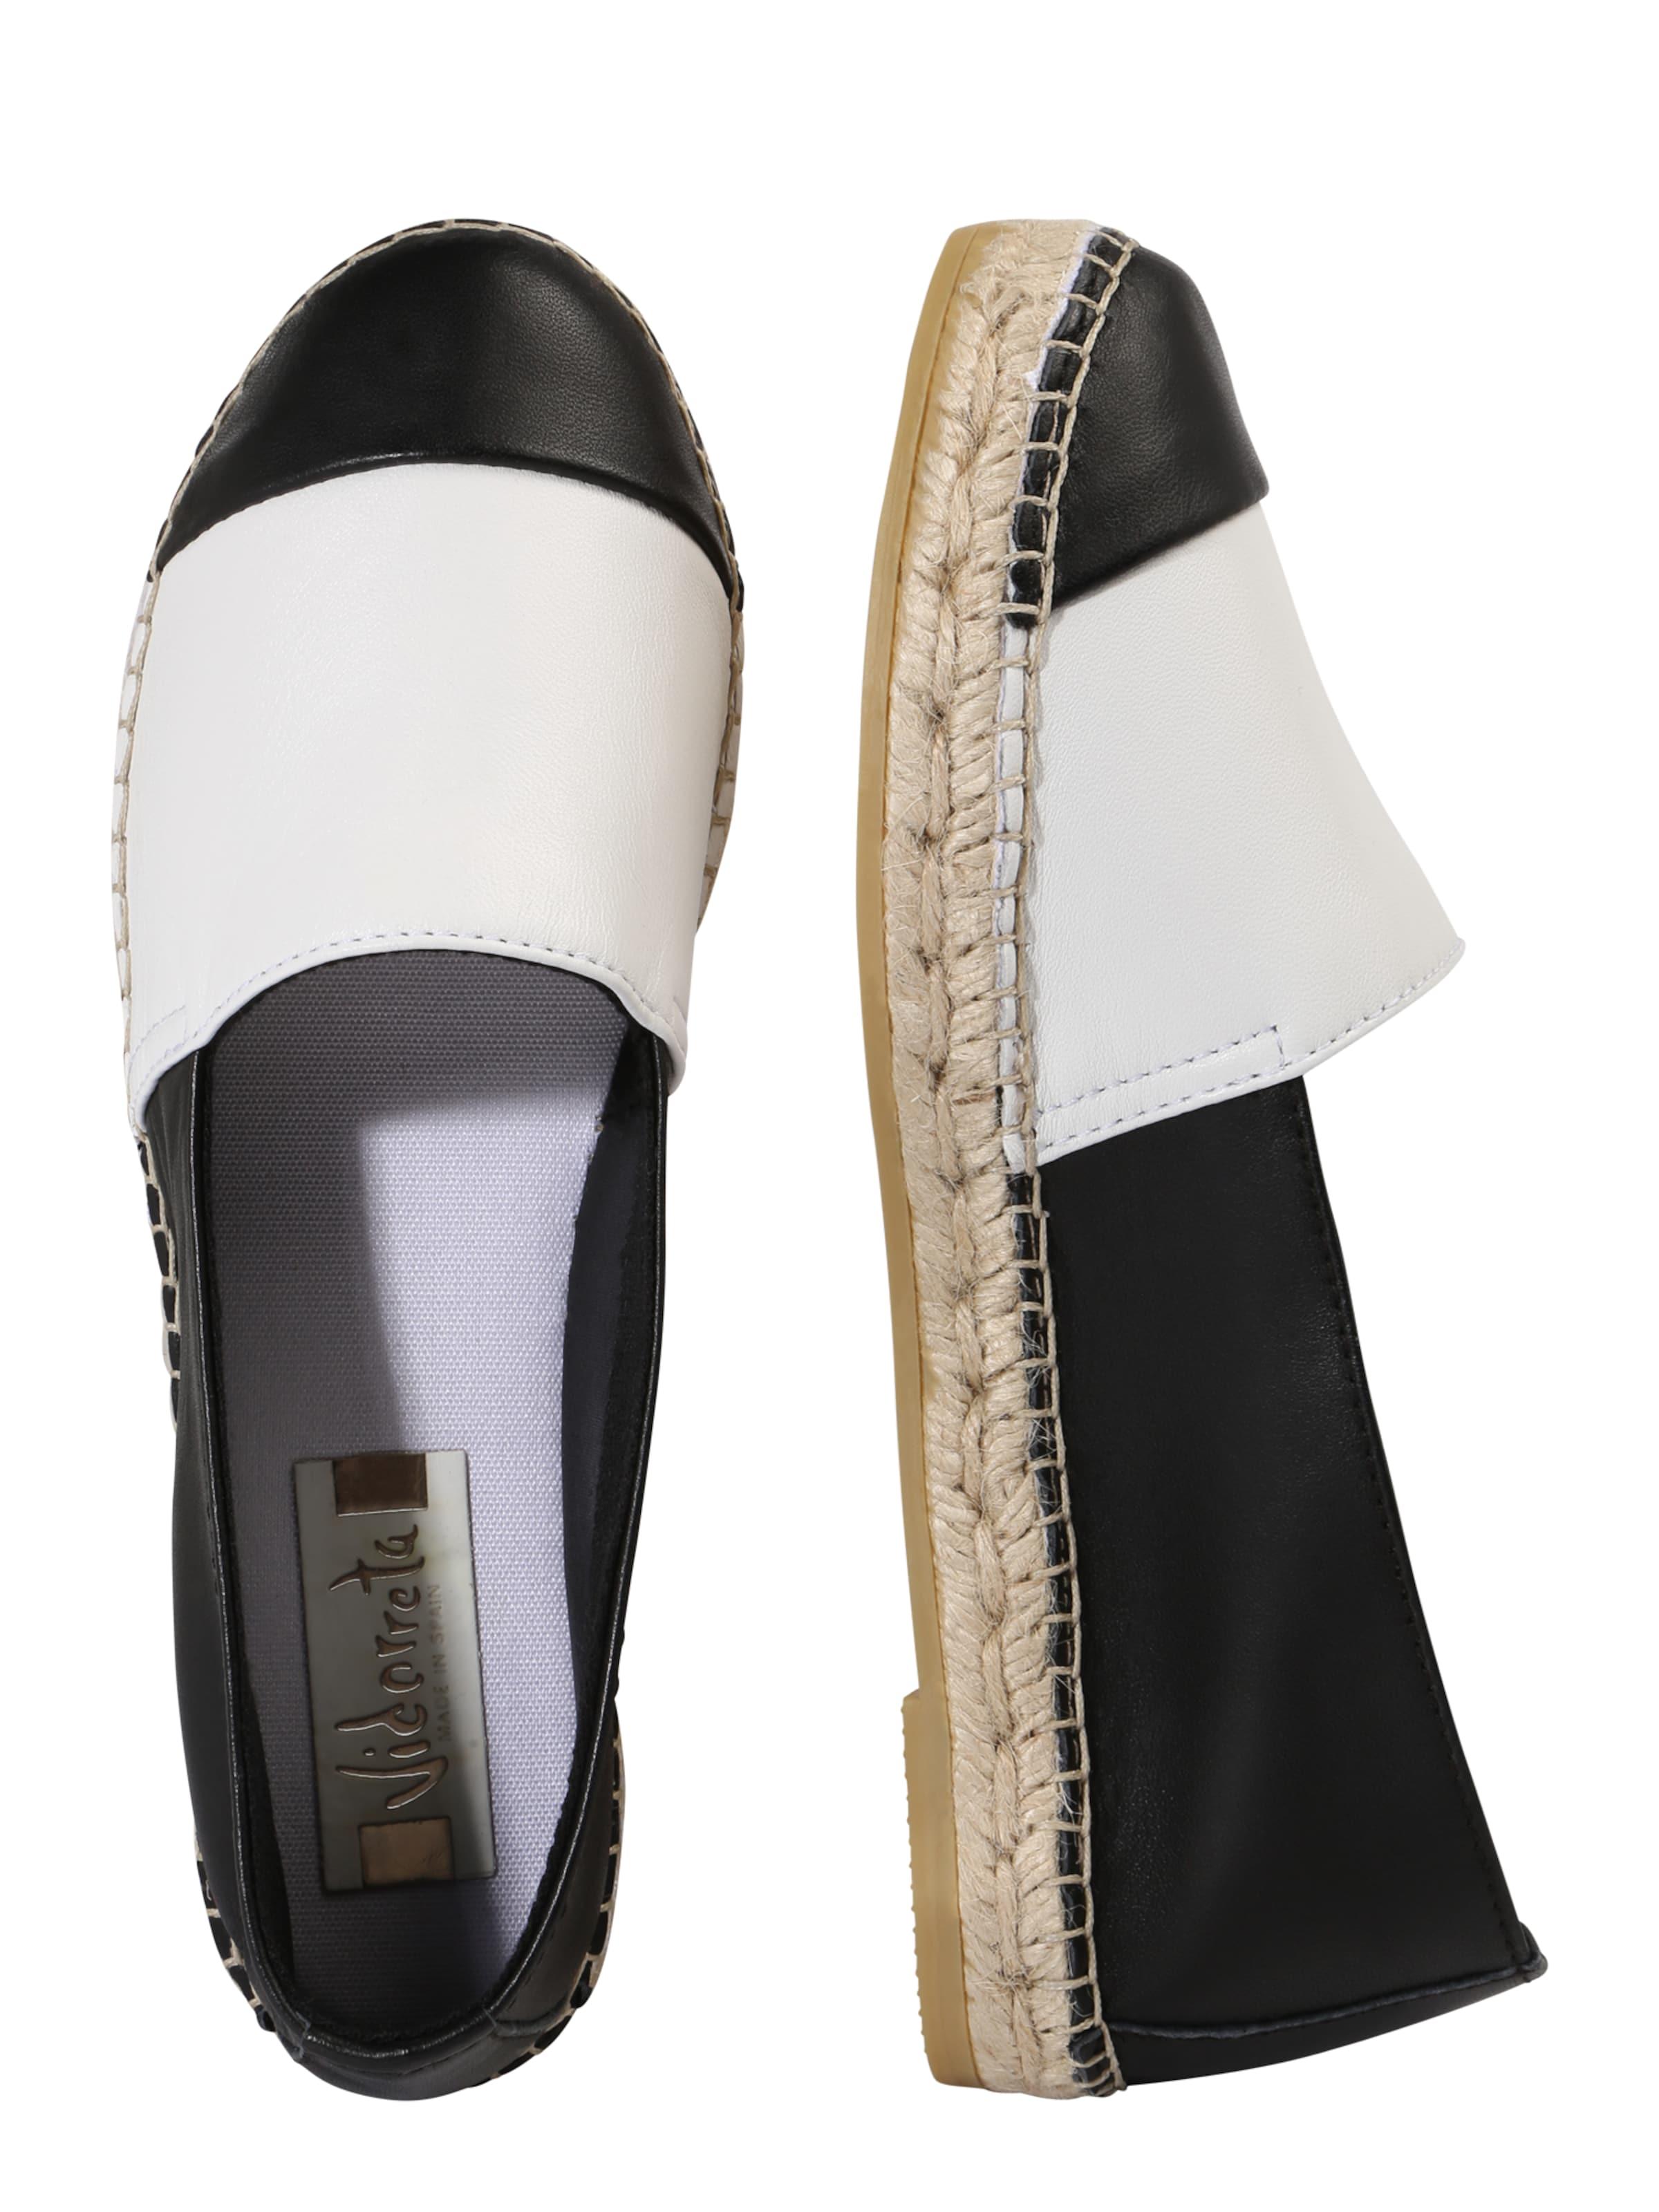 Billig Verkaufen Mode-Stil Vidorreta Espadrilles 'NAPT' Rabatt Aaa Outlet-Store Online-Verkauf dUrhtBK